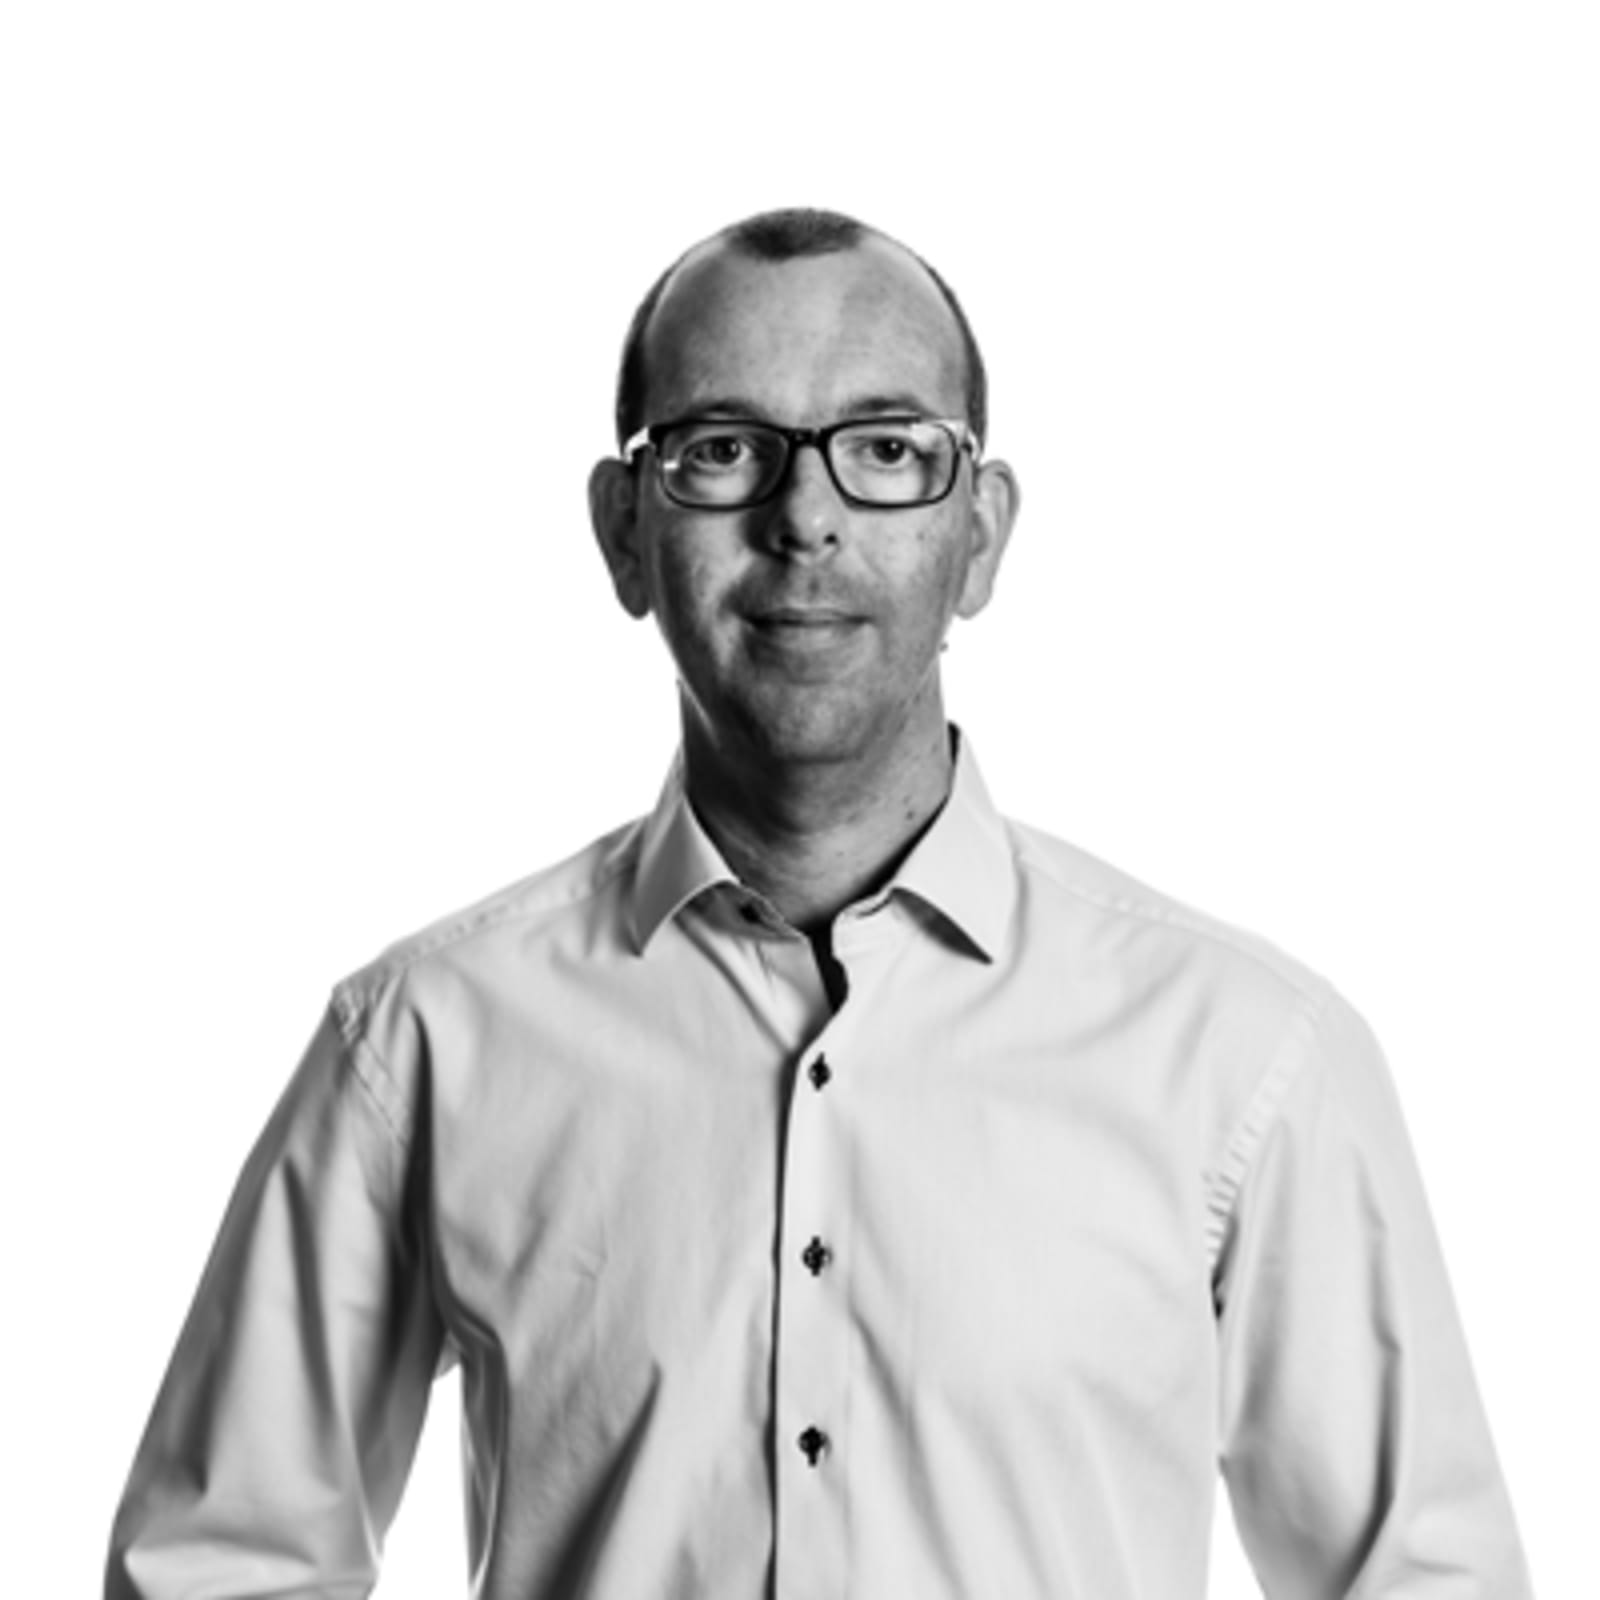 Marco Scheel